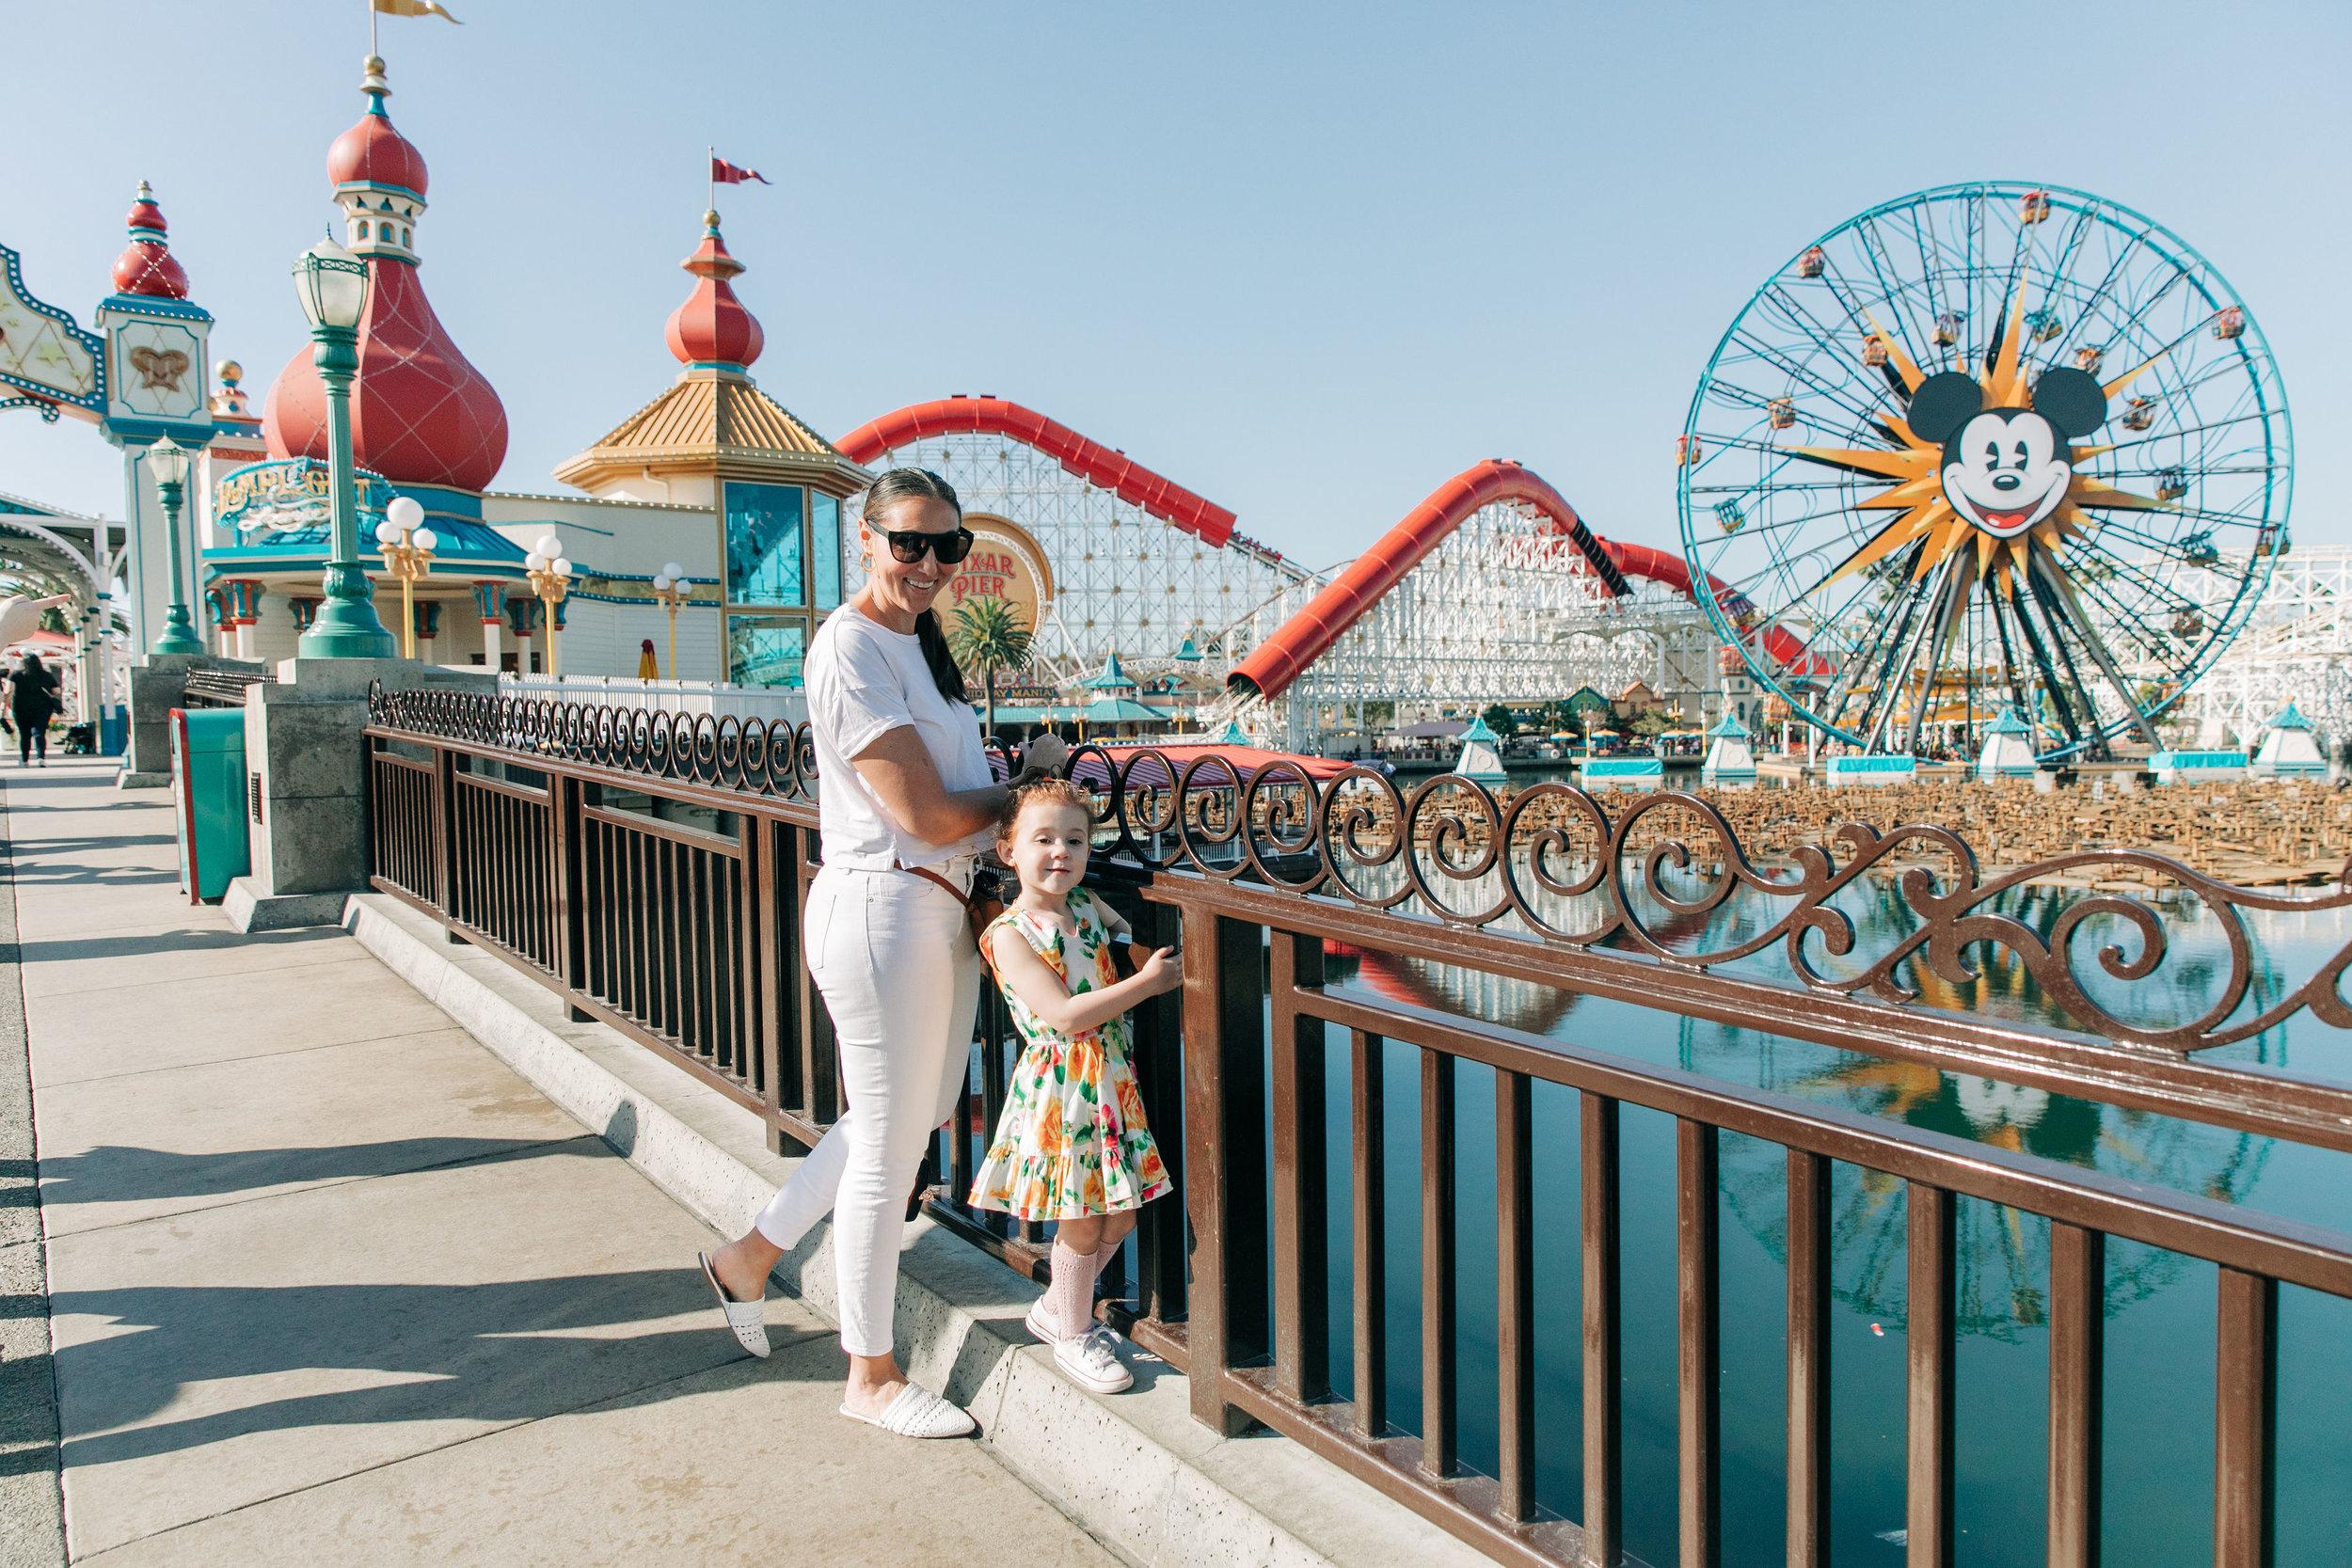 Disney_California_Adventure_LilyRoPhotography-34.jpg